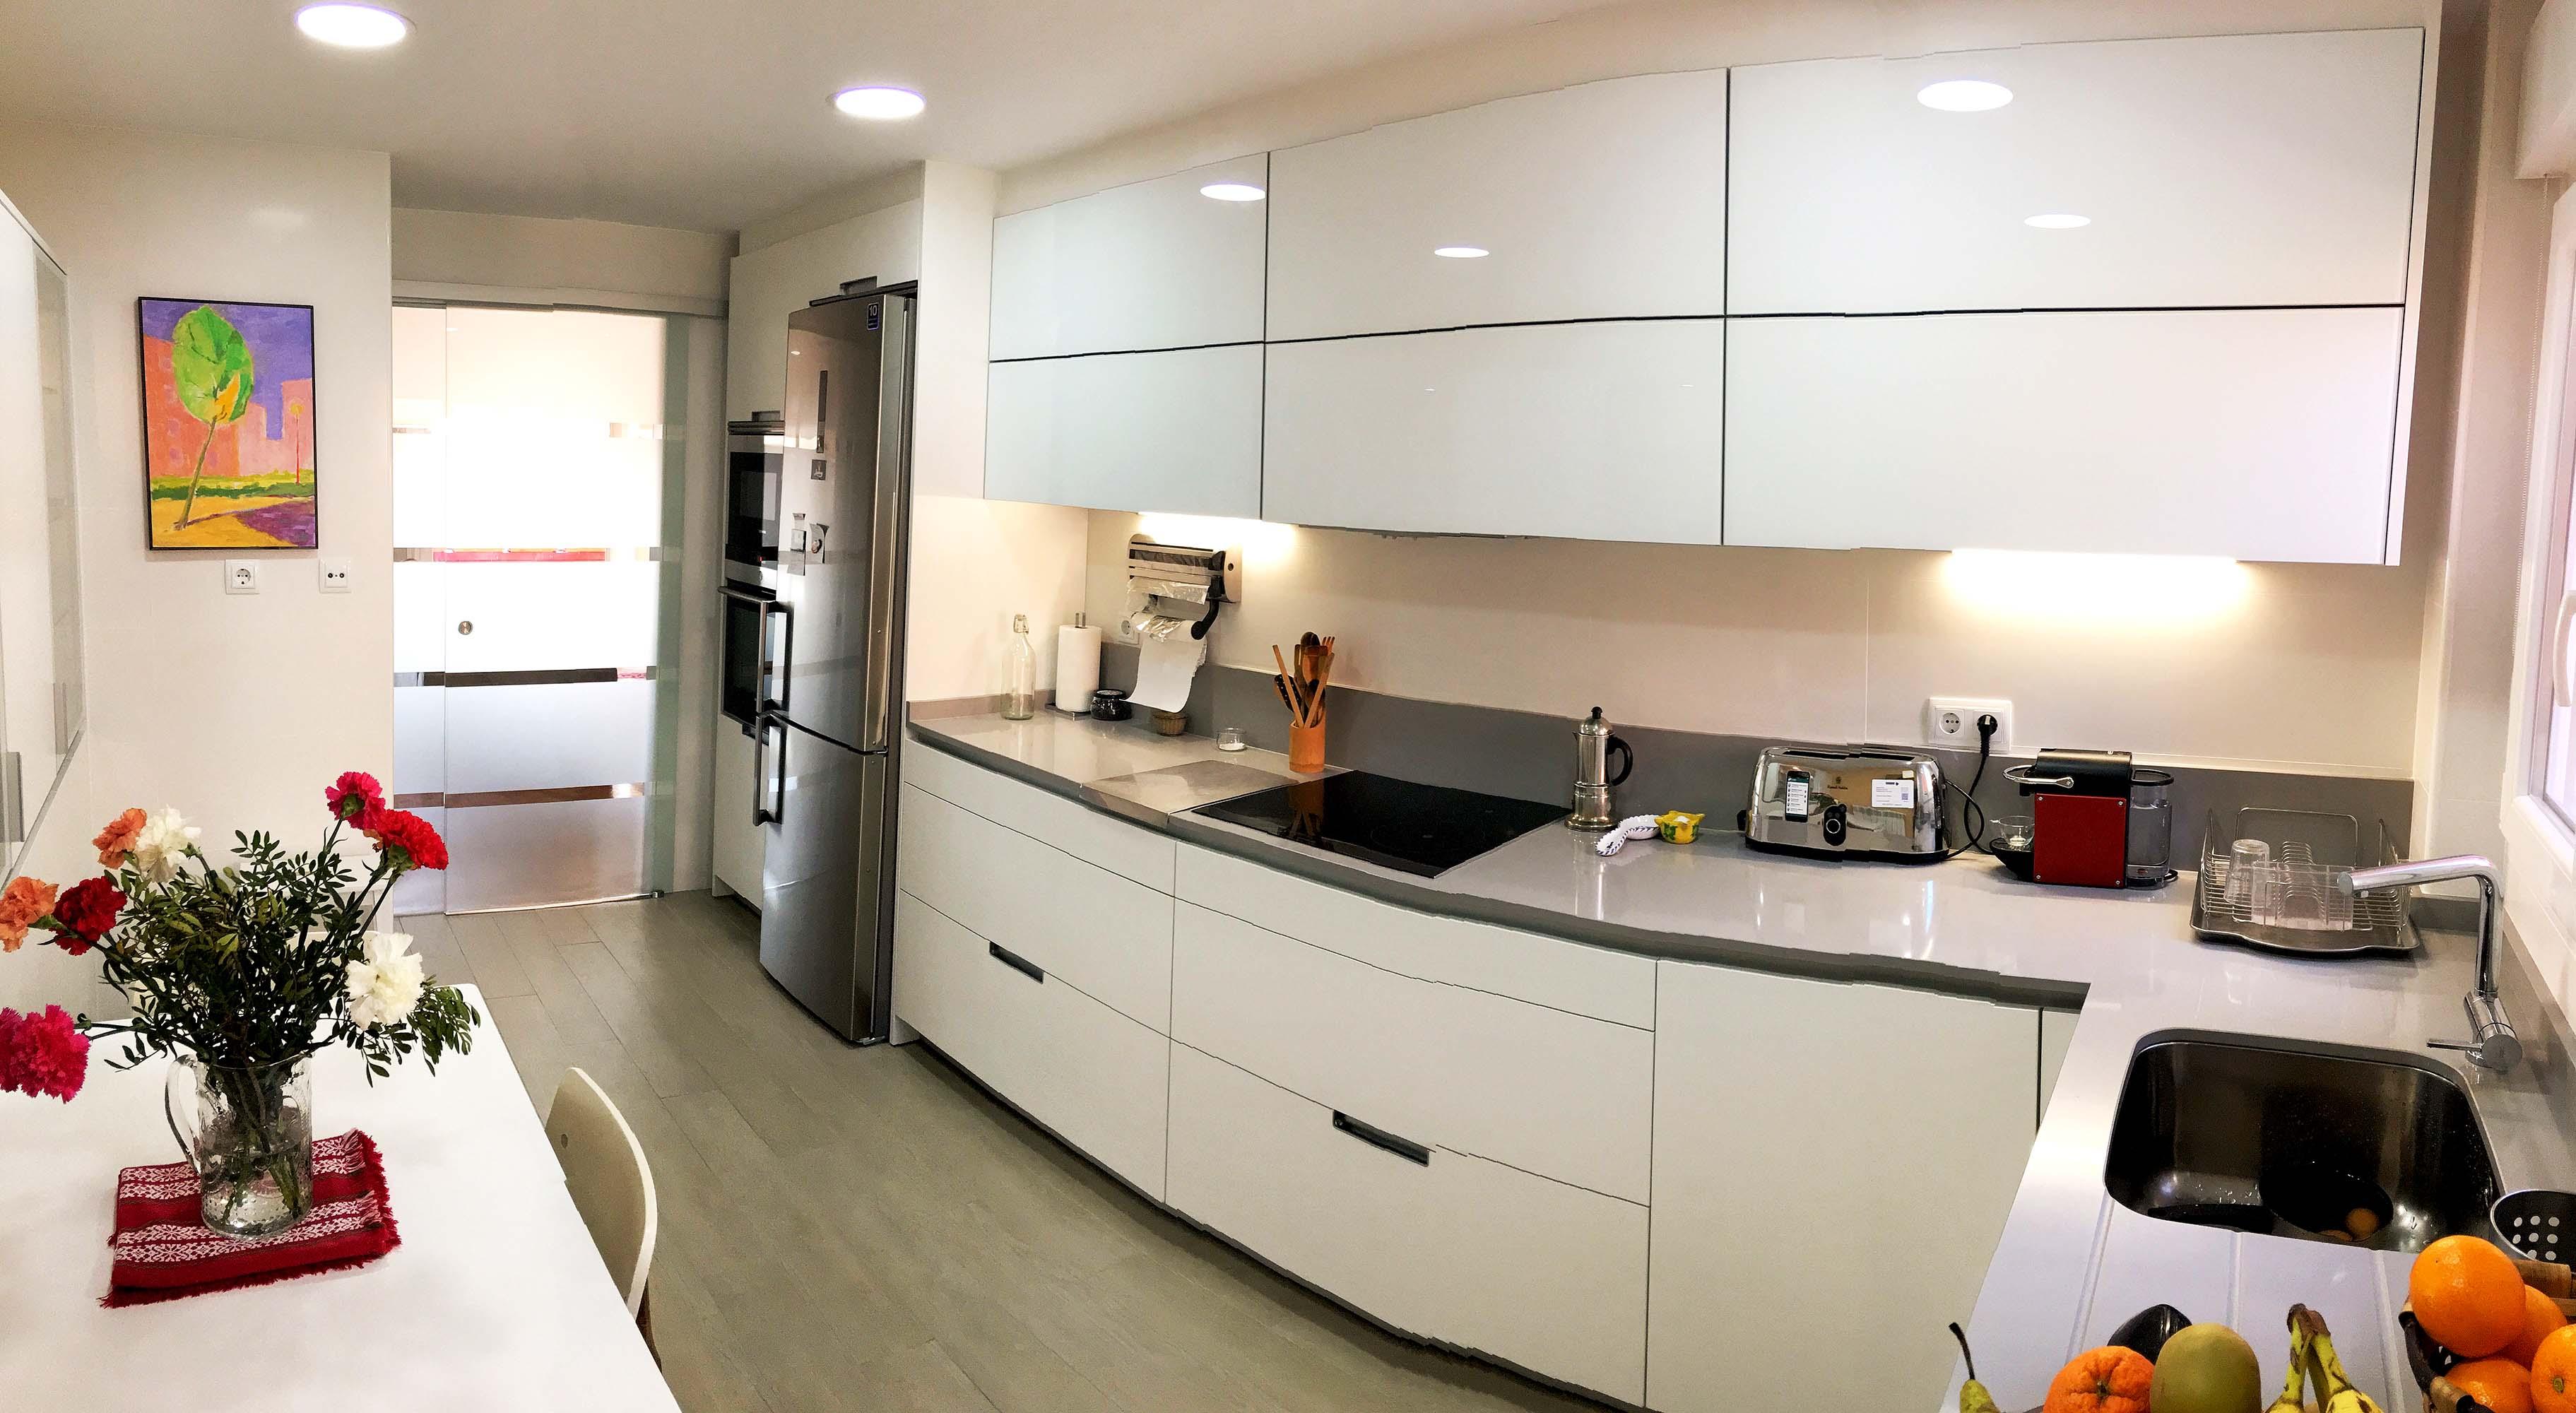 Muebles De Cocina Santos En Vigo # azarak.com > Ideas Interesantes ...